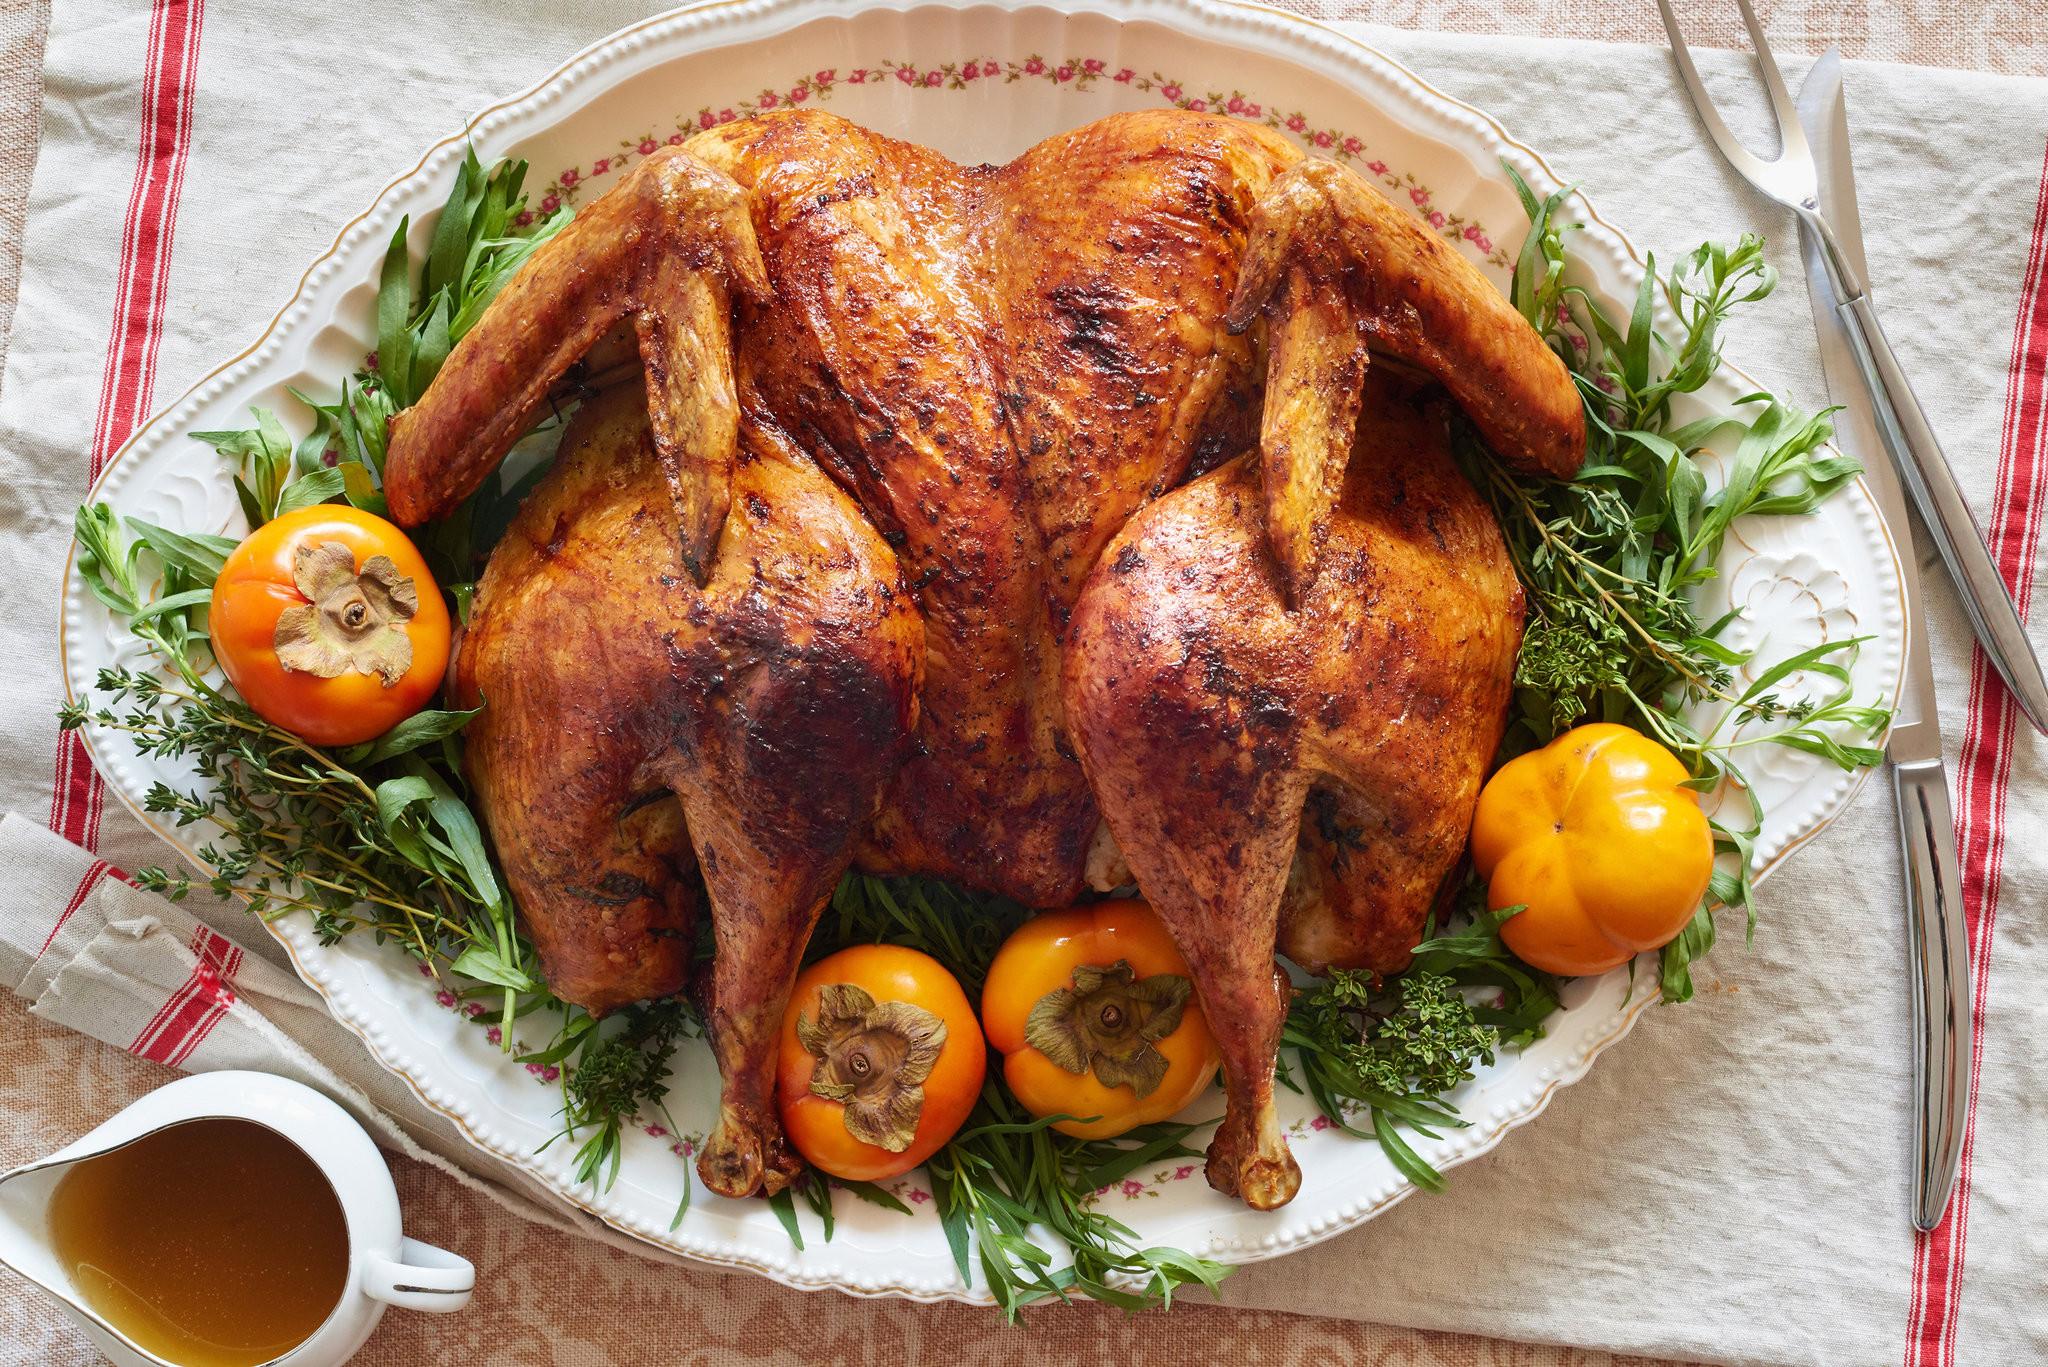 Roast Turkey Recipes Thanksgiving  45 Minute Roast Turkey Recipe NYT Cooking